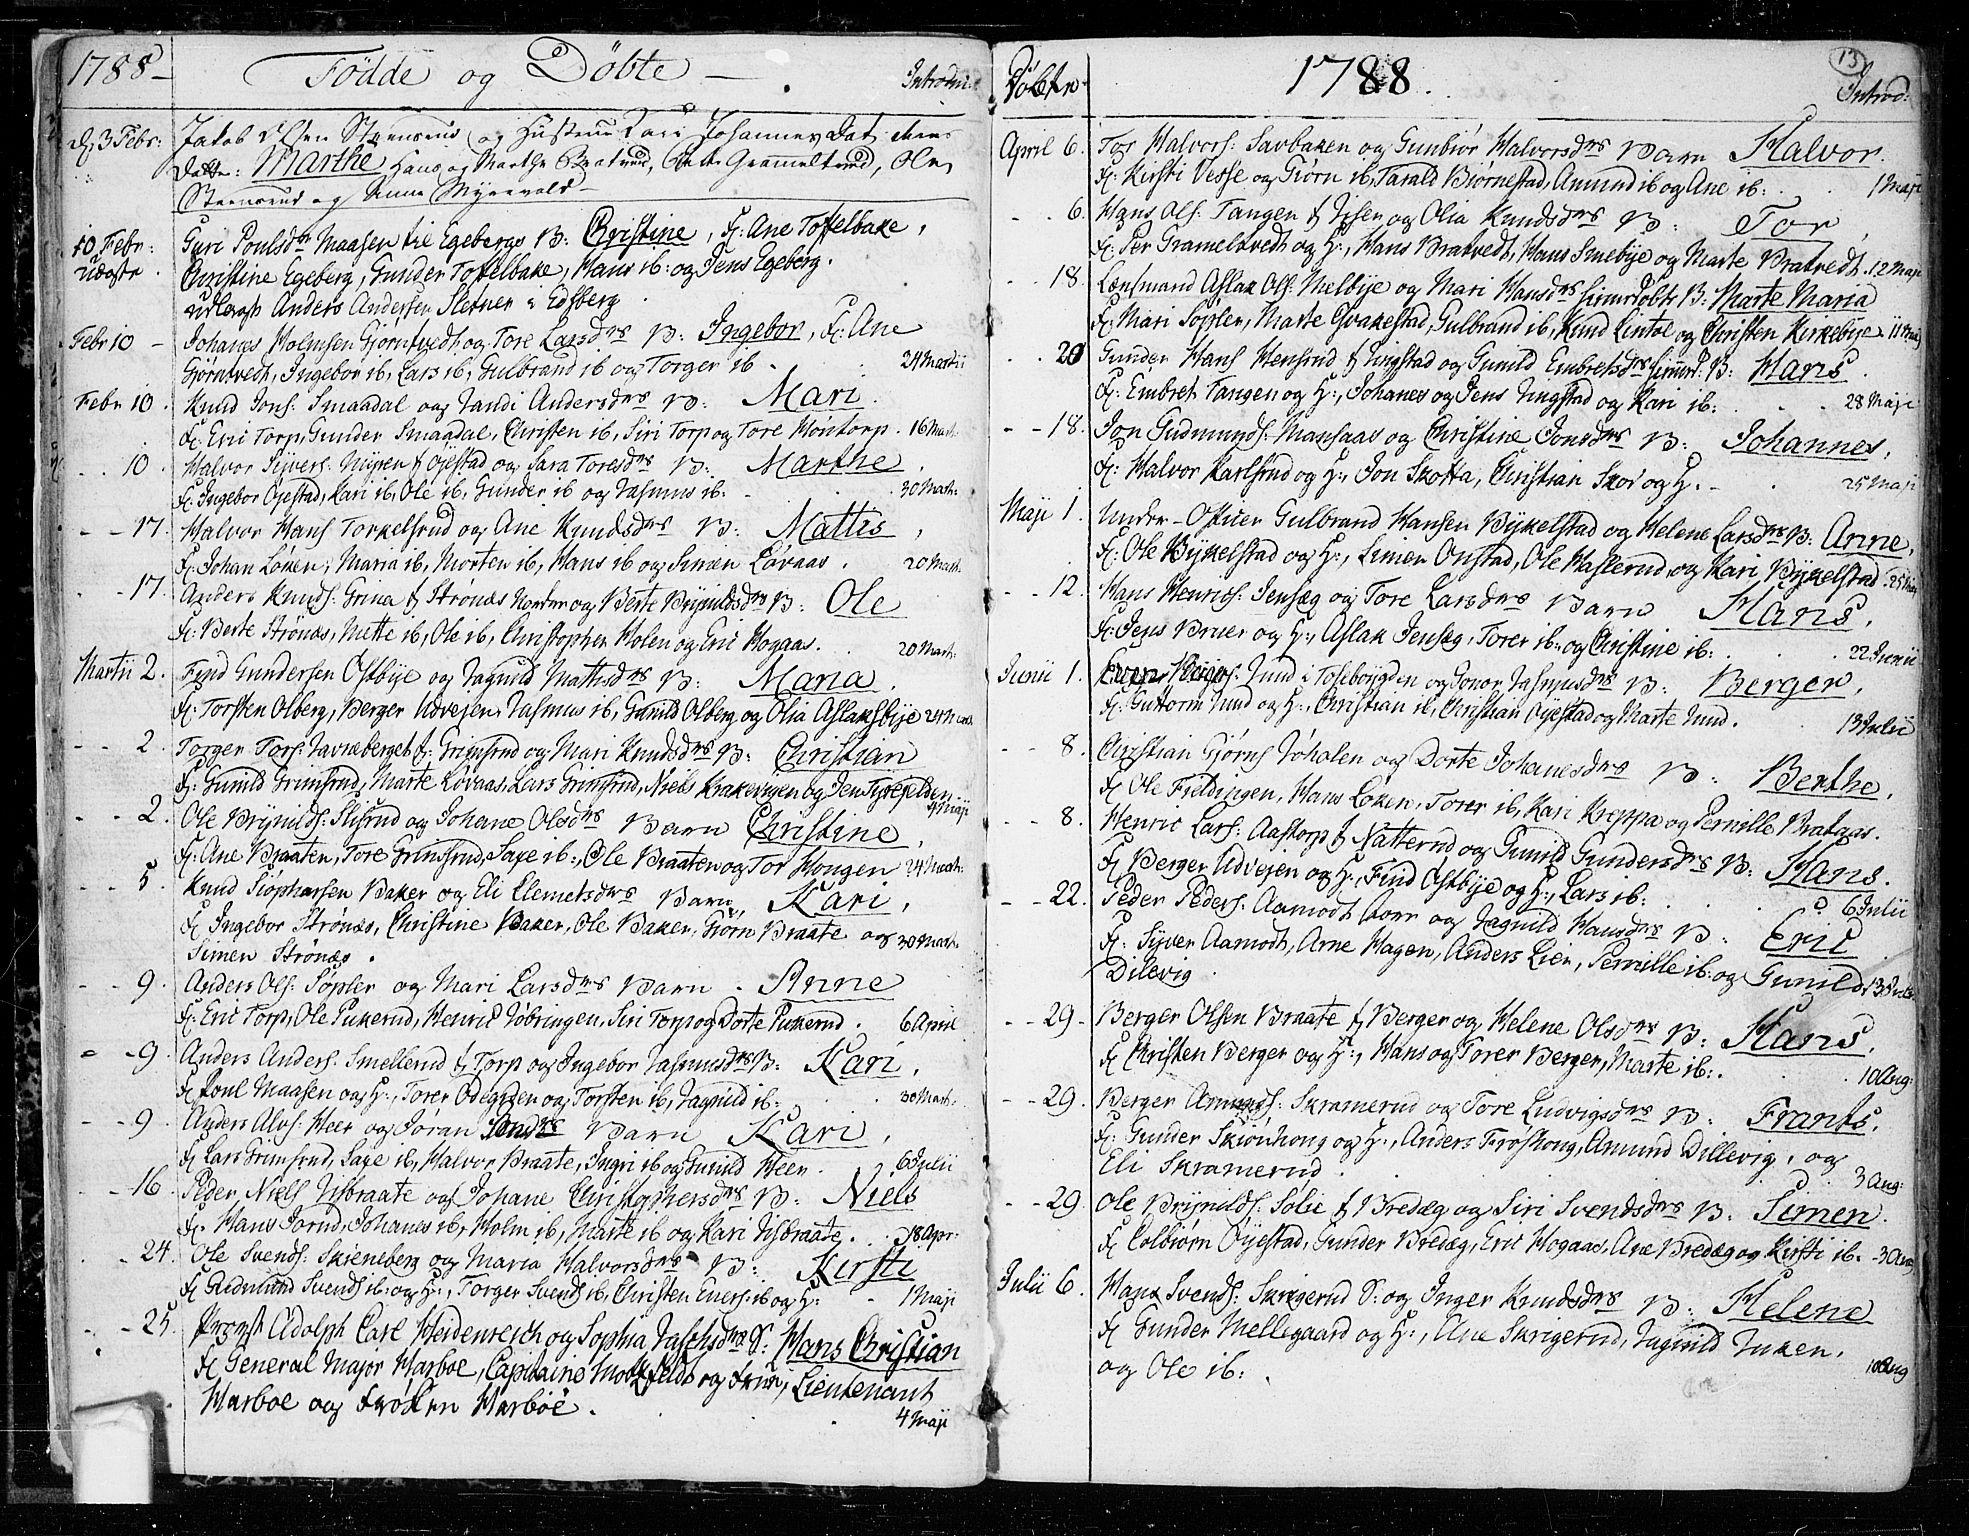 SAO, Trøgstad prestekontor Kirkebøker, F/Fa/L0005: Ministerialbok nr. I 5, 1784-1814, s. 13